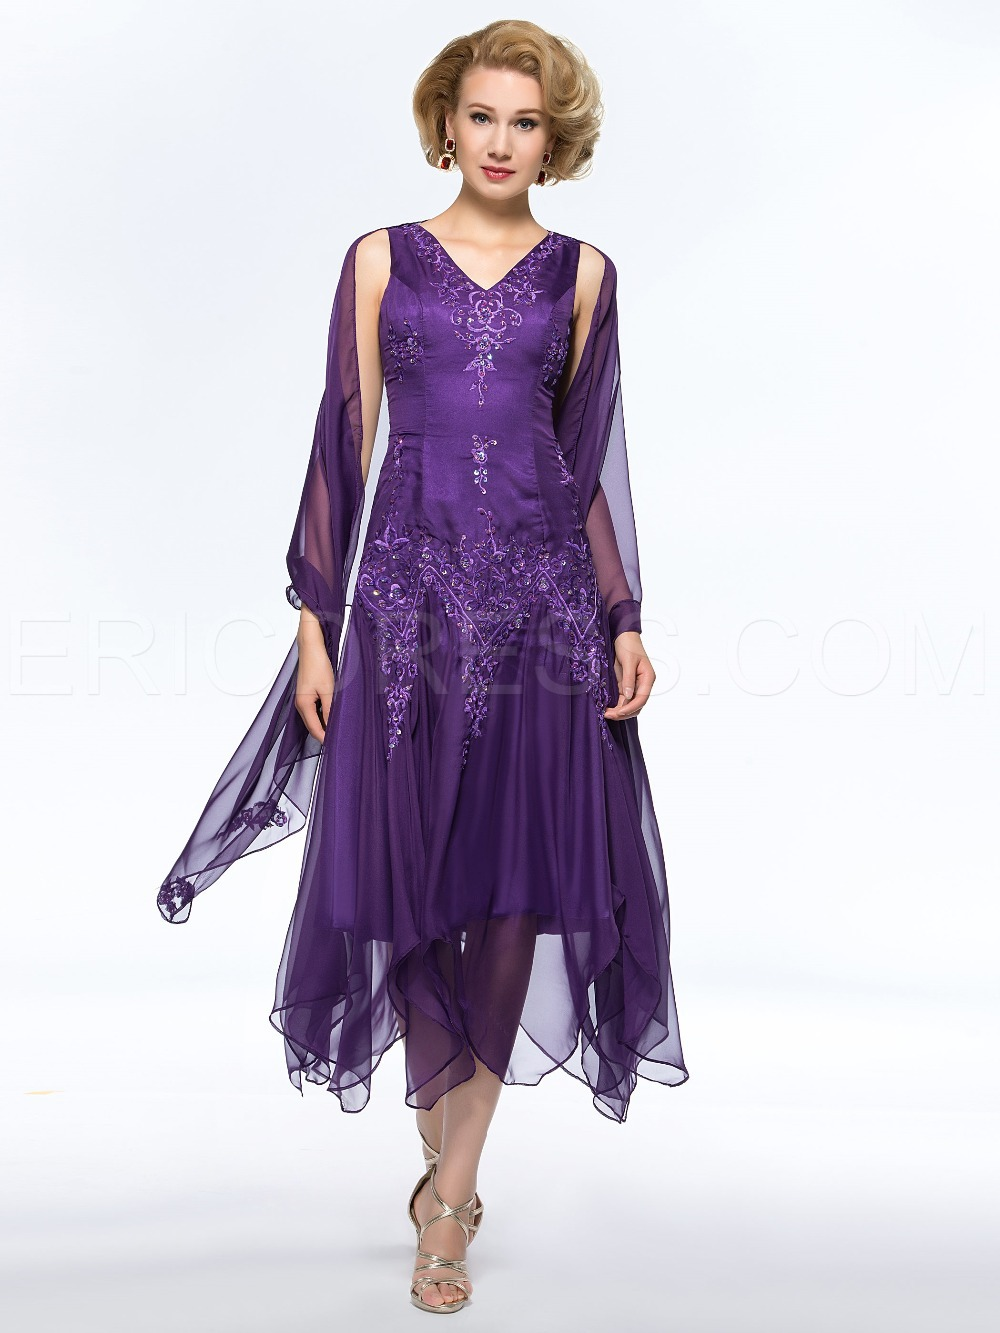 Get Quotations · Chiffon Tea Length Mother of the Lace Bride Dresses Pant  Suits Groom Brides Mother Dresses for 0e31d85fa8e2